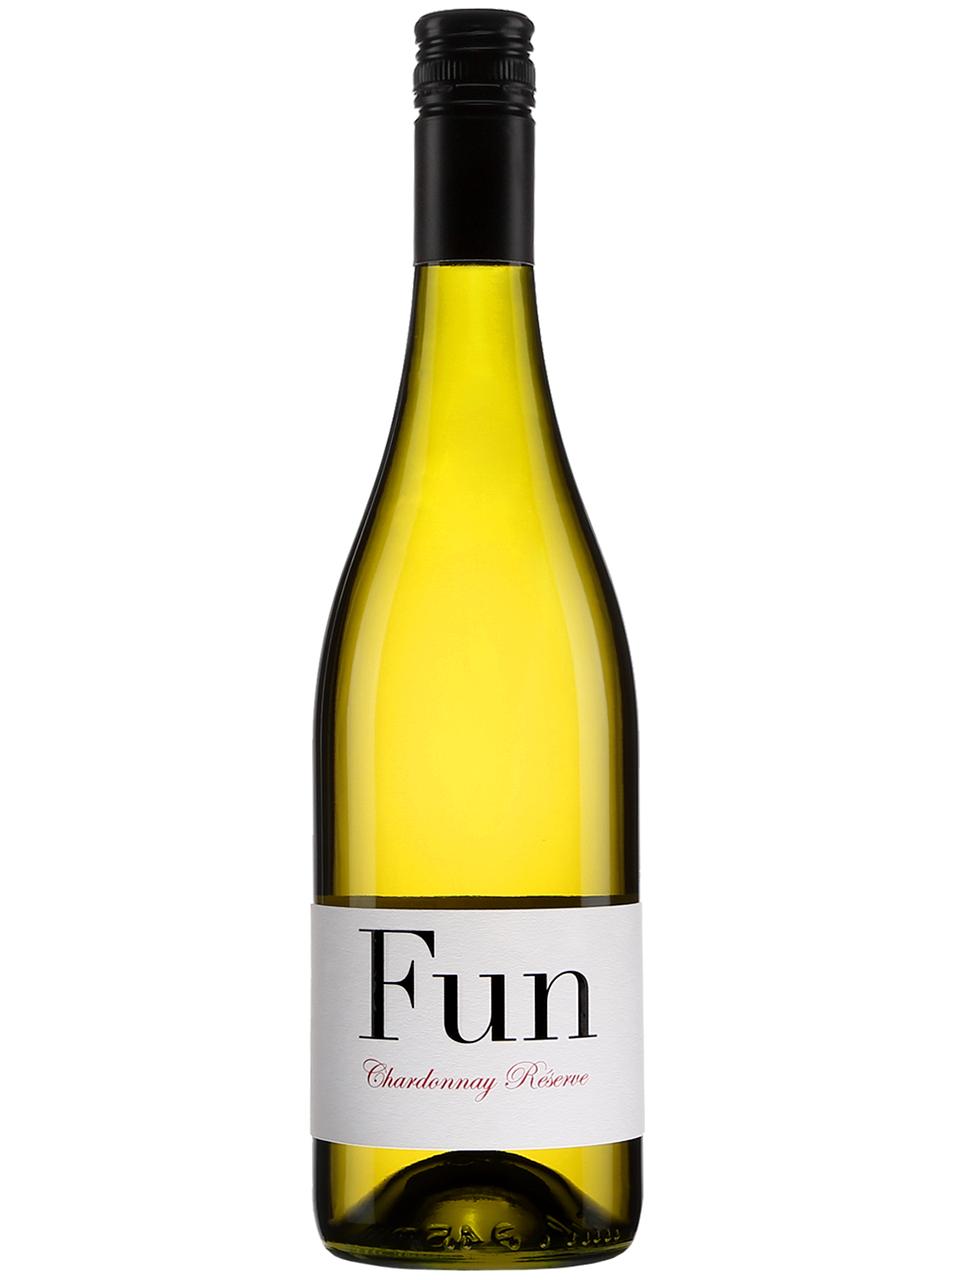 Fun Reserve Chardonnay